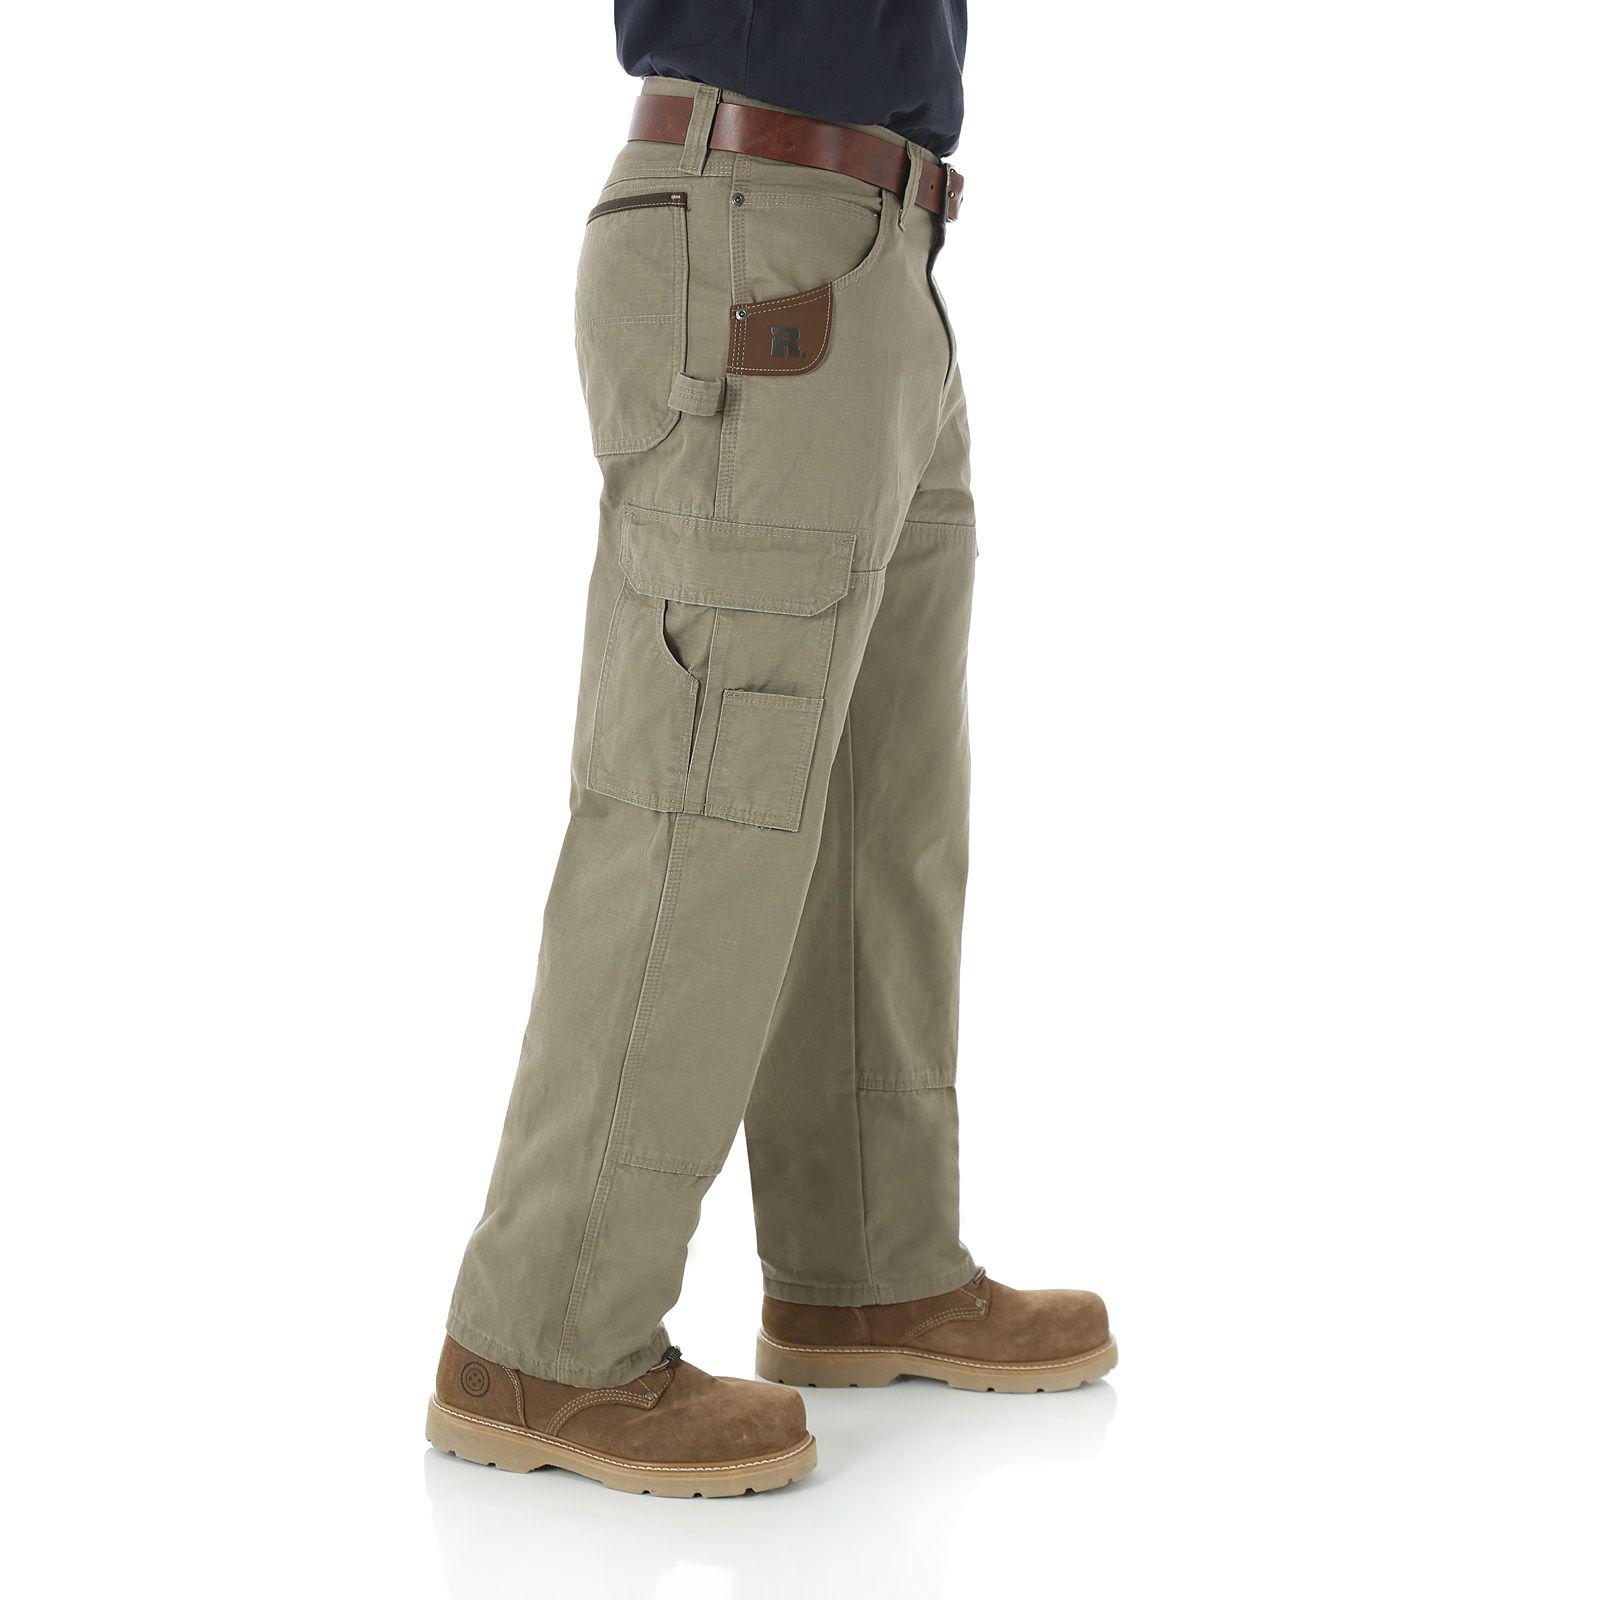 Wrangler Riggs Workwear Ripstop Ranger Pant Cargo Pants Men Mens Work Pants Work Wear